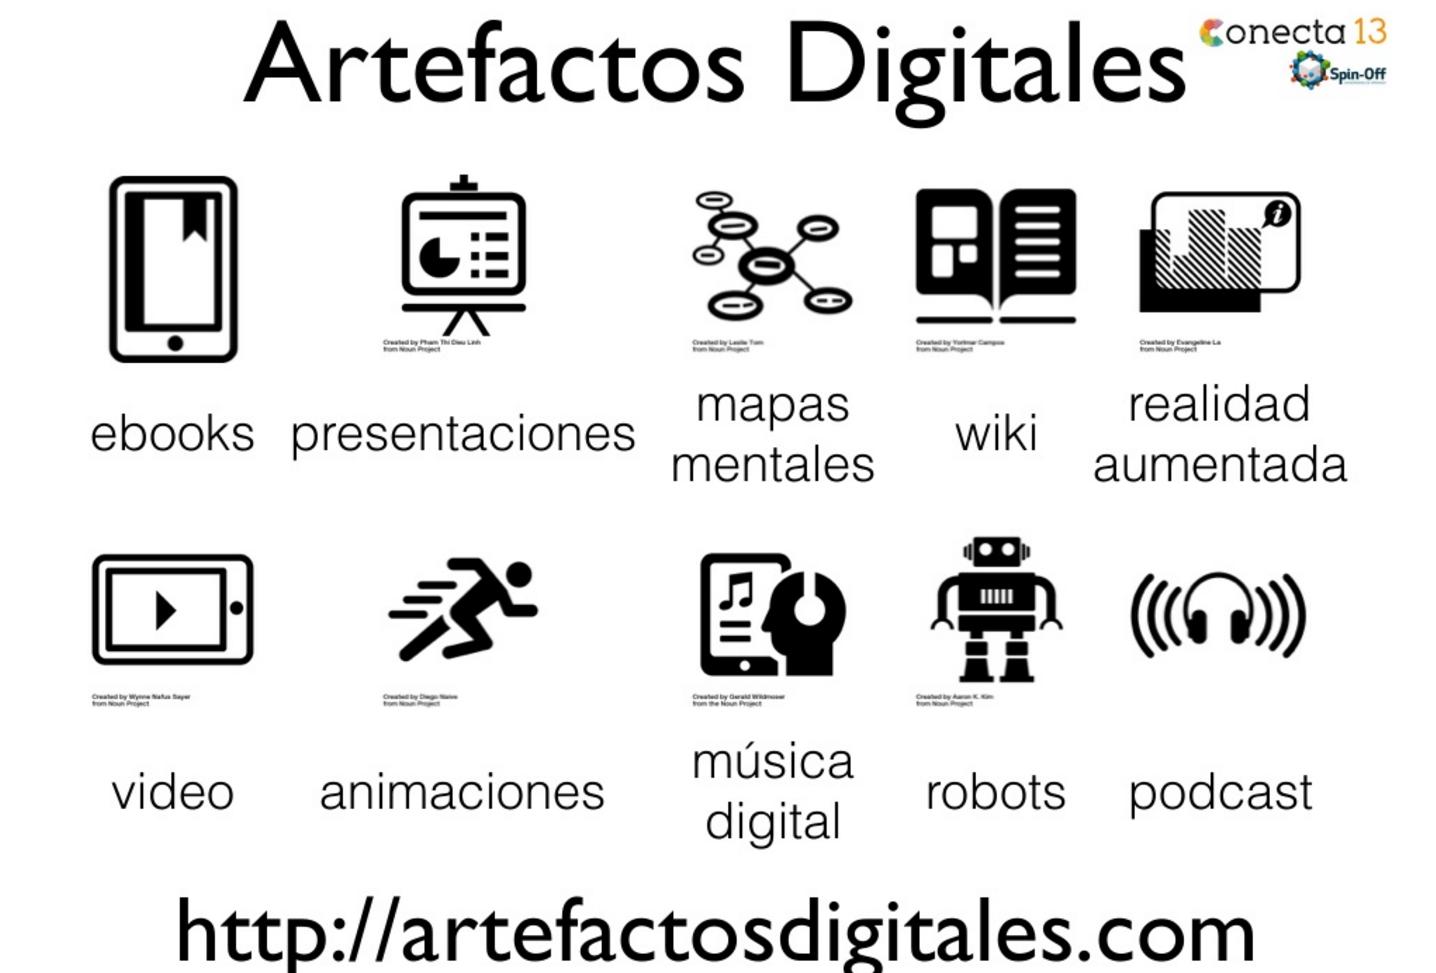 aartefactos_digitales1